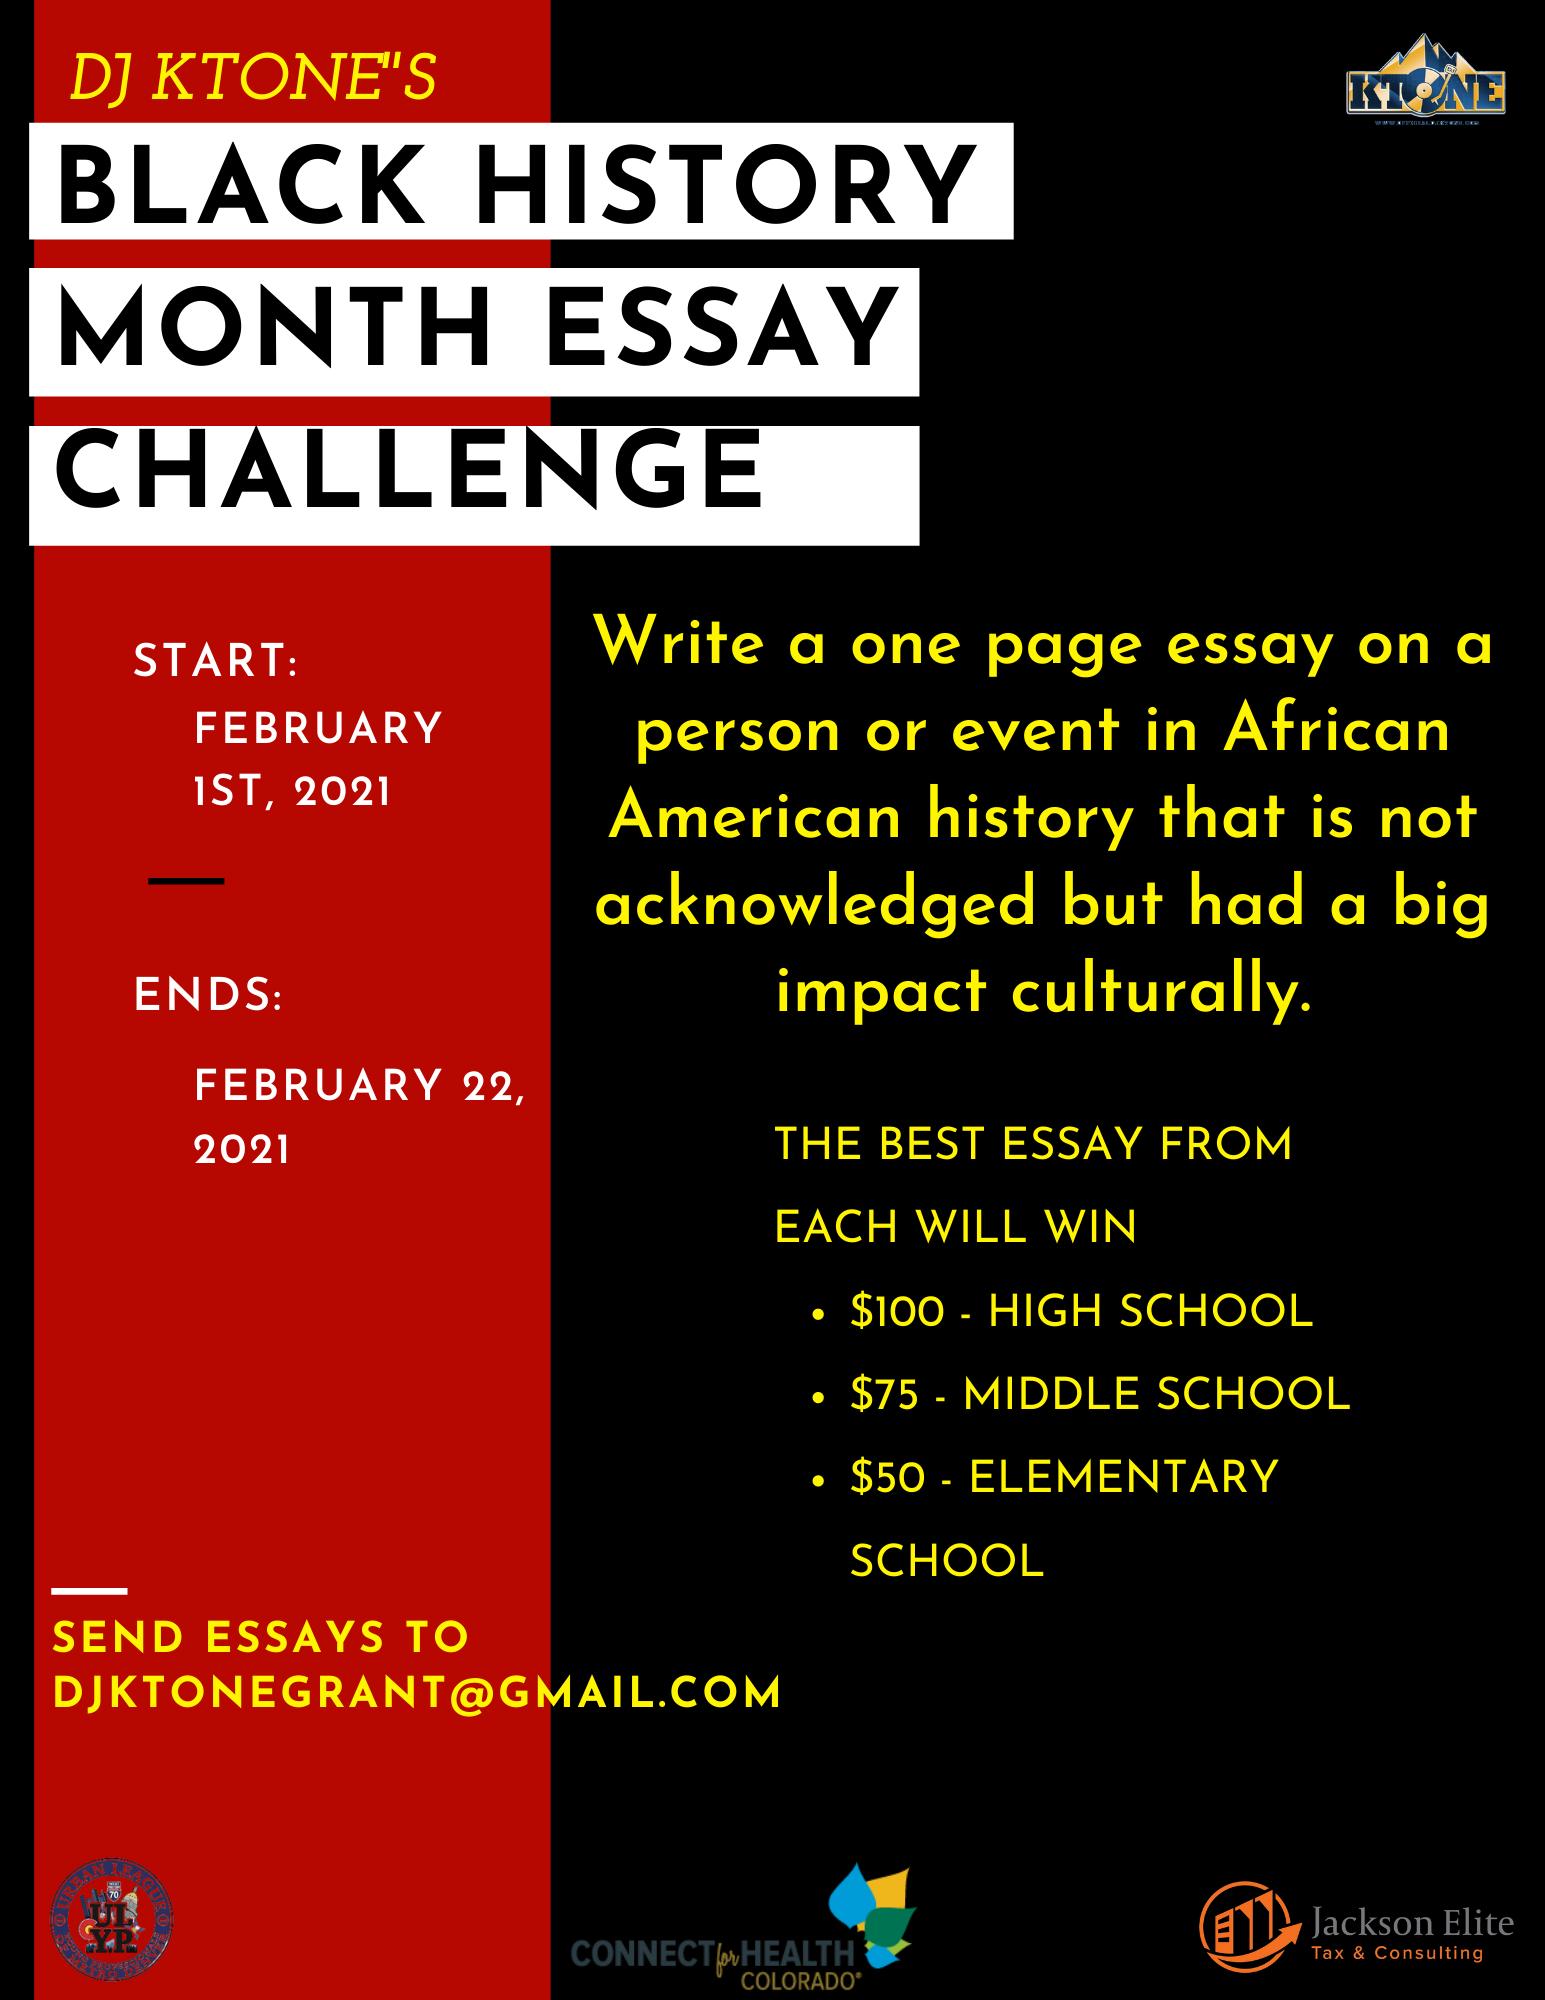 Black History Month Essay Challenge